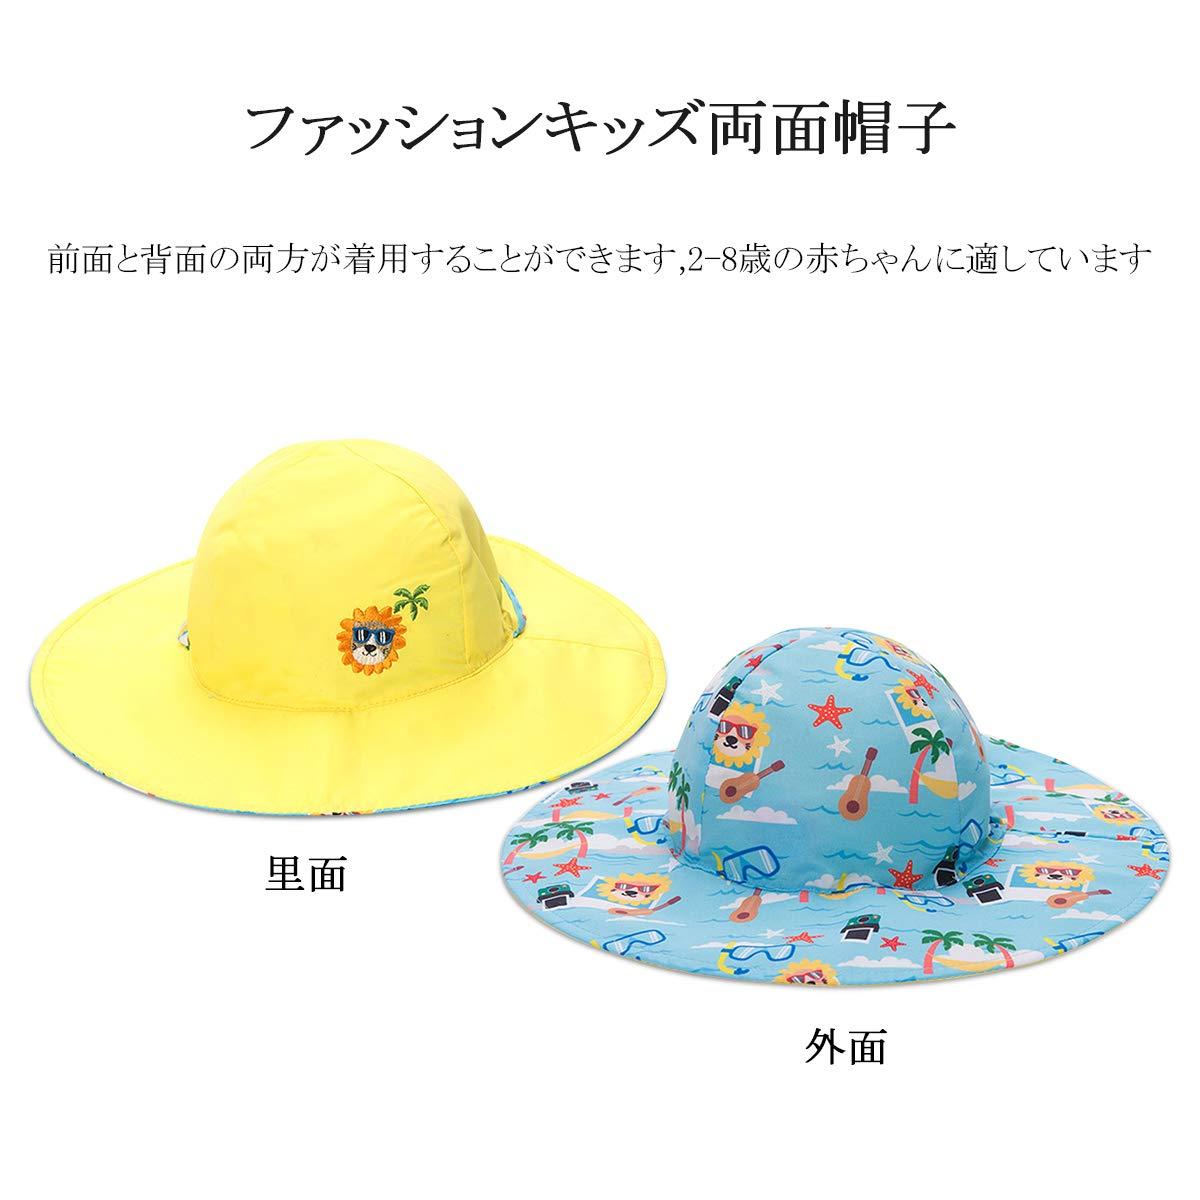 195f6e1854131 Amazon.co.jp: DORRISO 人気 可愛い 子供ハット つば広 赤ちゃんキャップ サファリハット キッズ 帽子 子供サンバイザー  フィッシャーマンハット女の子 男の子 UV ...